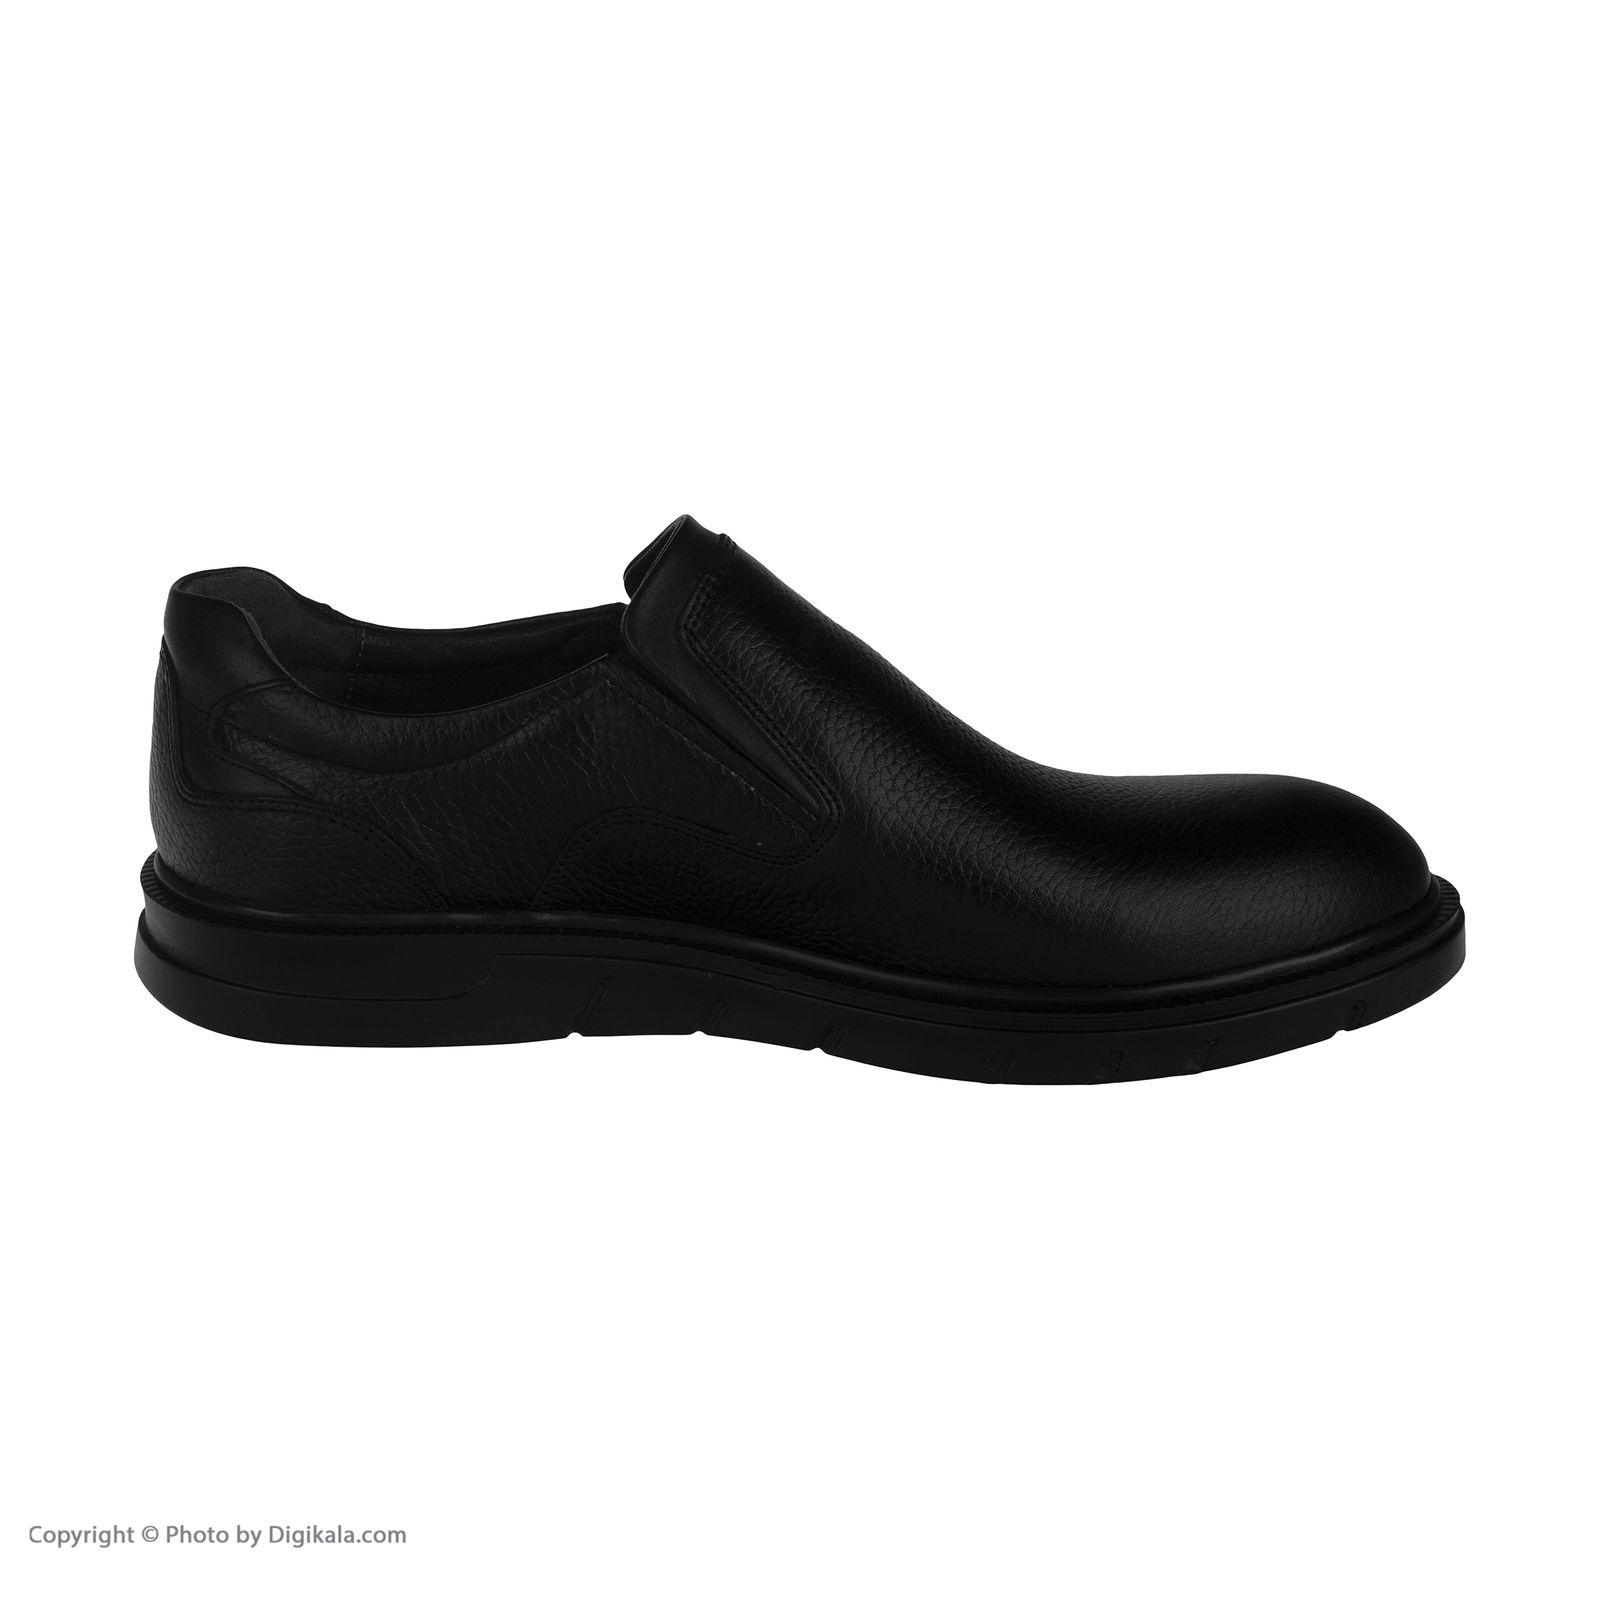 کفش روزمره مردانه بلوط مدل 7240C503101 -  - 7